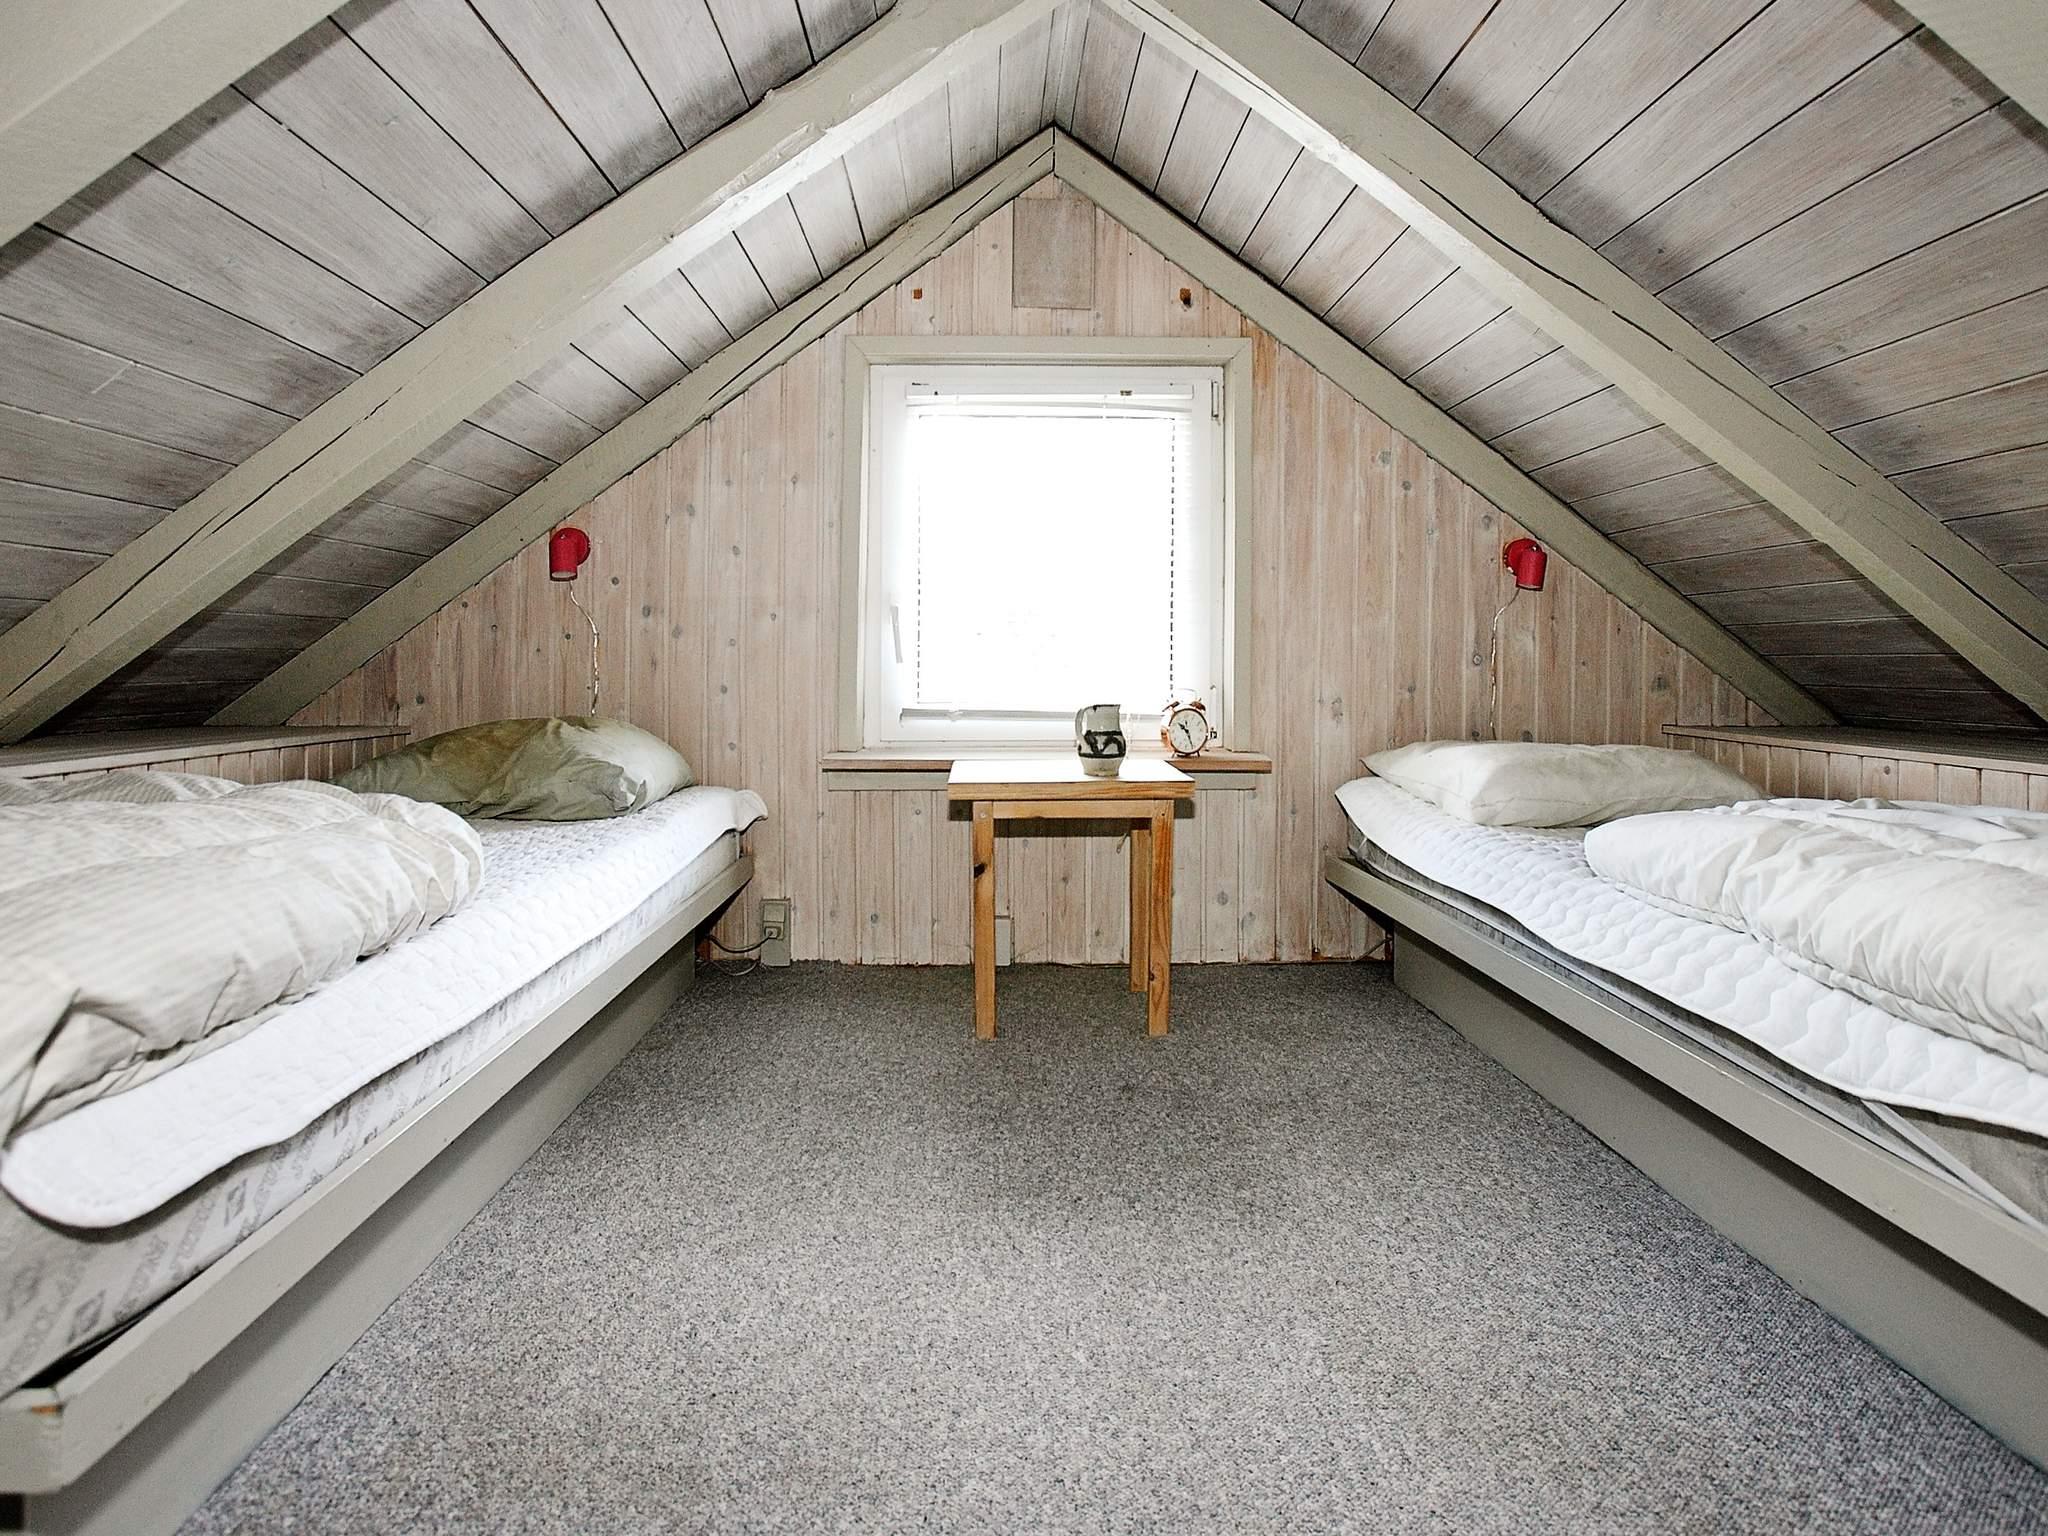 Ferienhaus Øster Hurup (88055), Øster Hurup, , Ostjütland, Dänemark, Bild 10